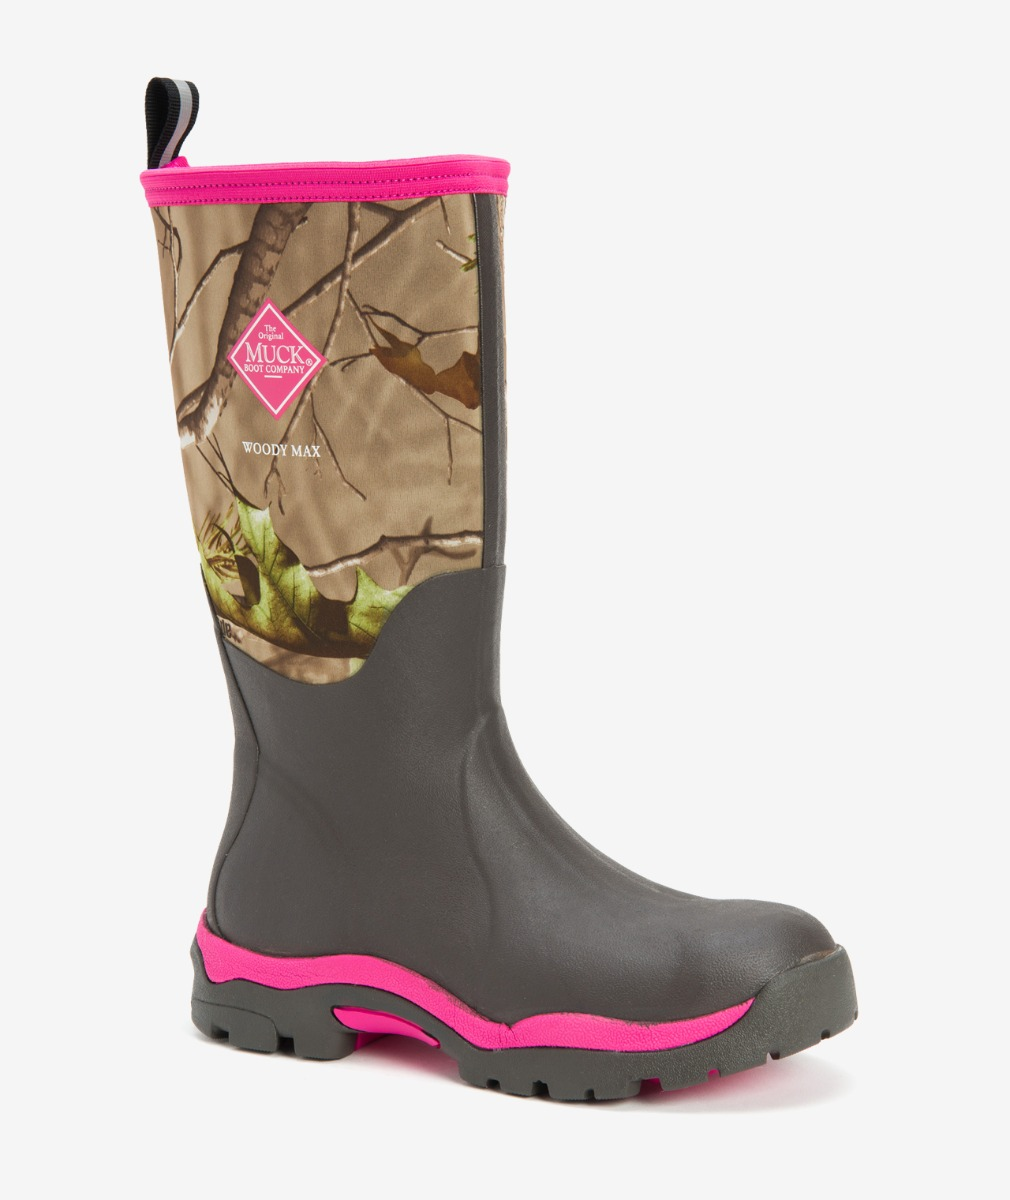 Muck Boot Women's Woody PK Versatile Hunting Boot in Pink